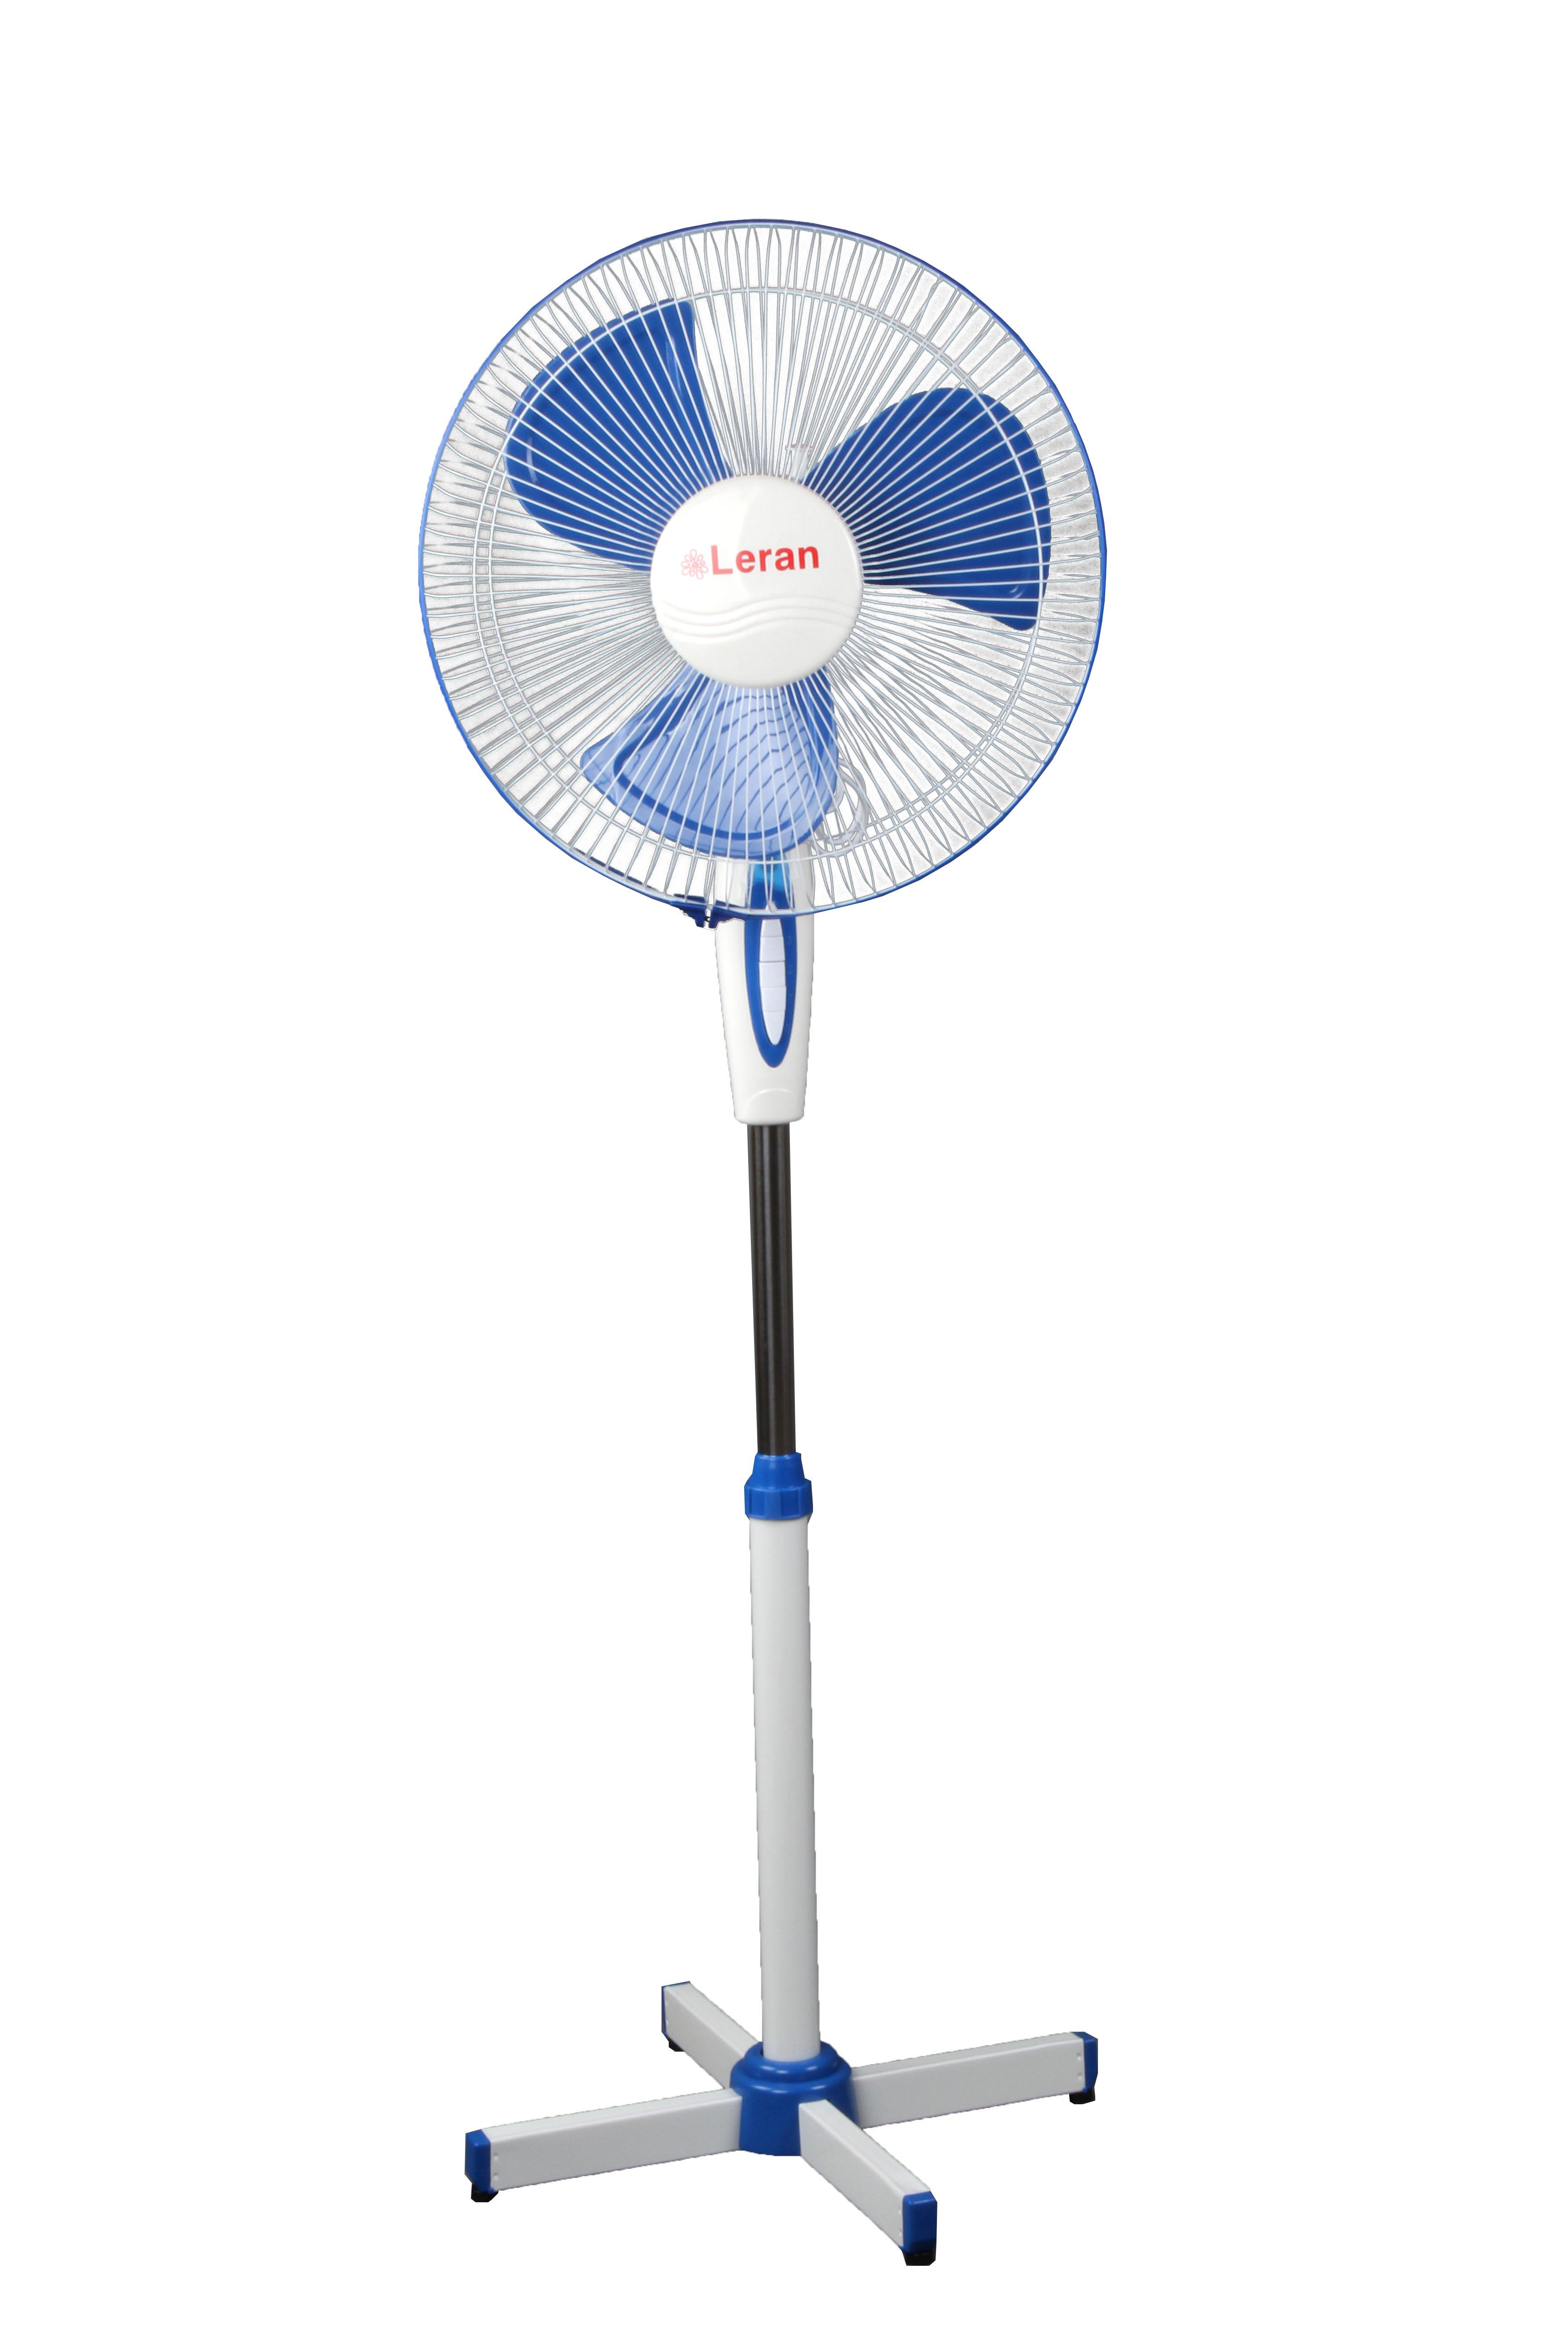 Вентилятор Leran Real Brand Technics 499.000